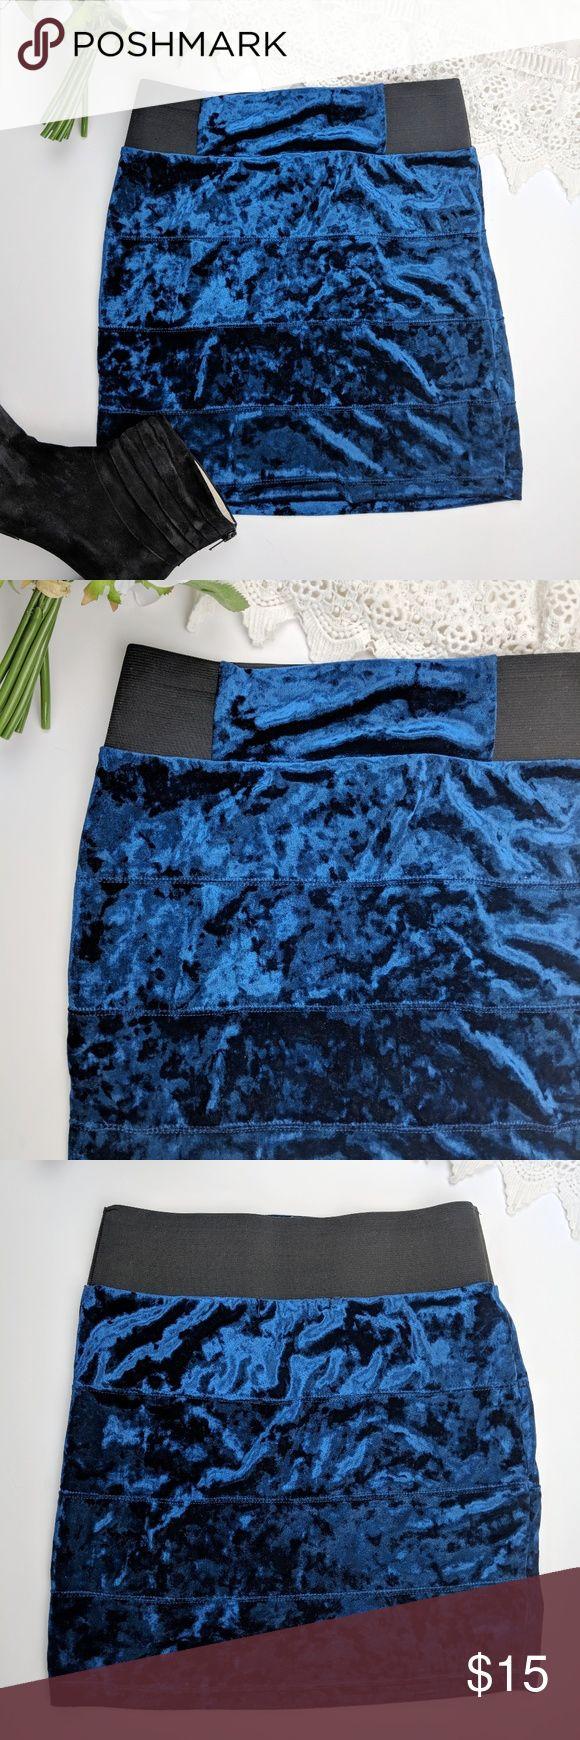 Forever 21 royal blue velvet bodycon skirt Gorgeous blue Velvet miniskort, bodycon style. Black elastic waist band. Excellent condition! Perfect for a night out. Forever 21 Skirts Mini